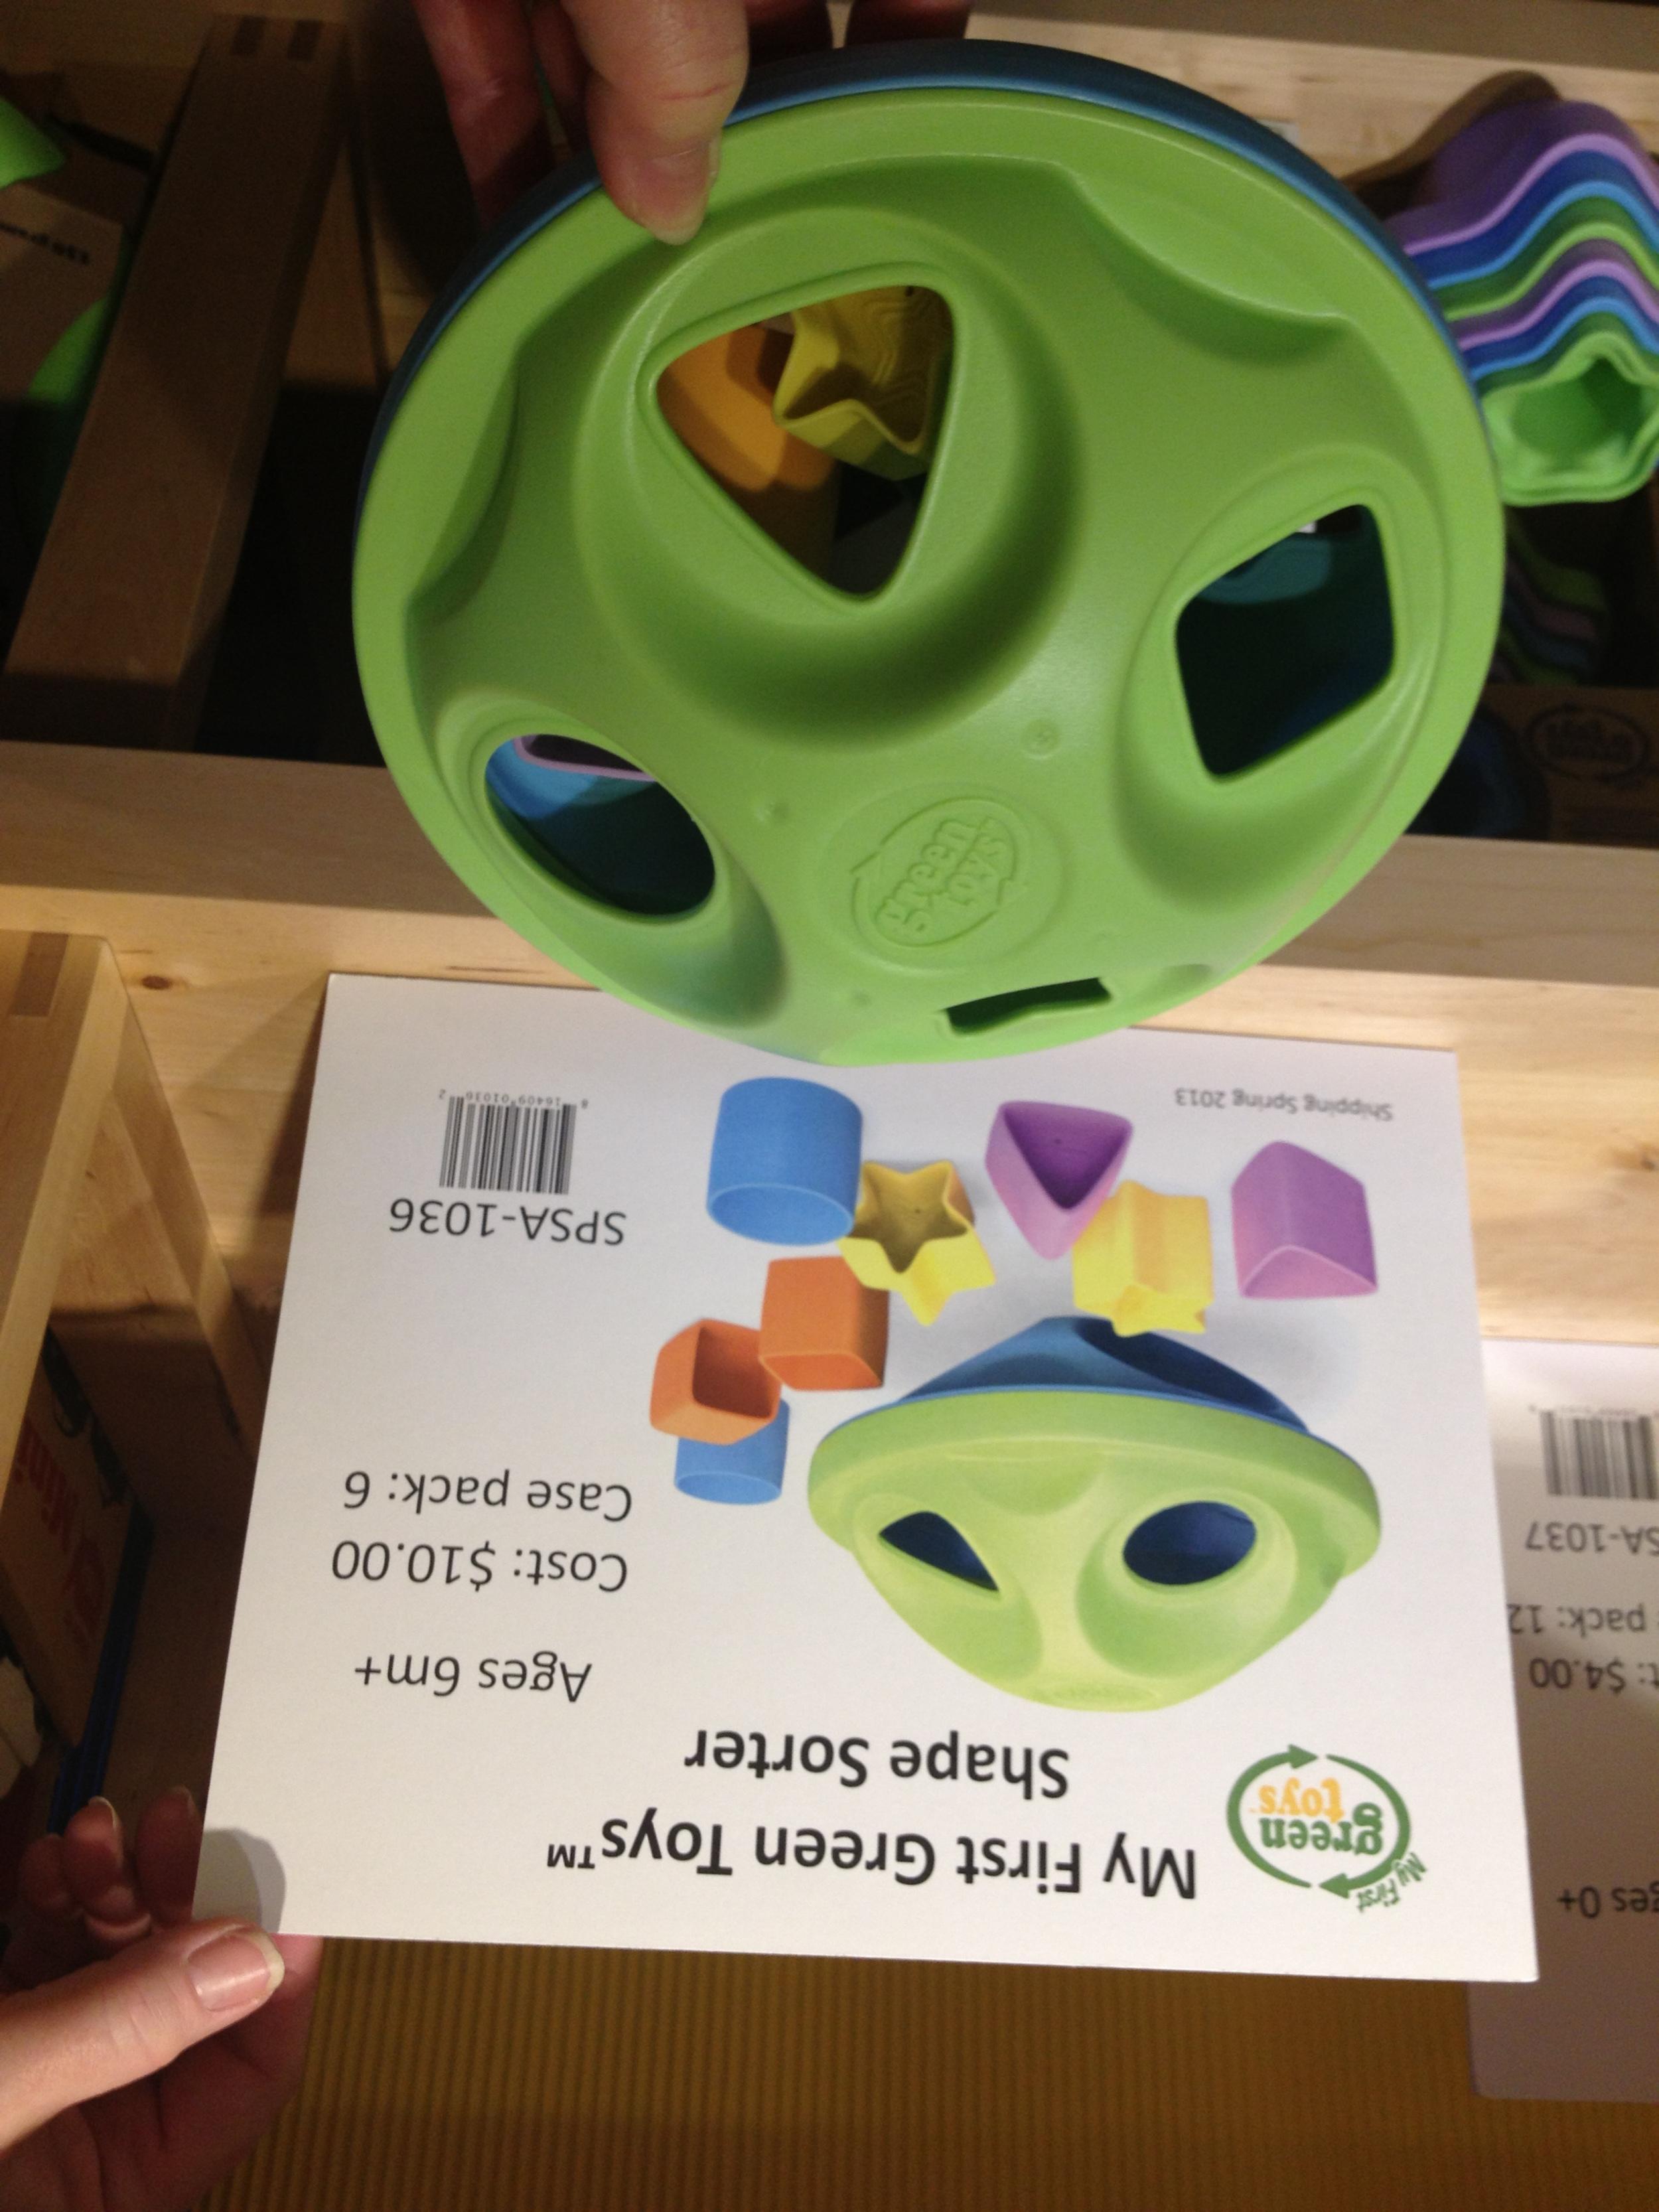 Toys_in_Portland_Green_Toys_Shape_Sorter